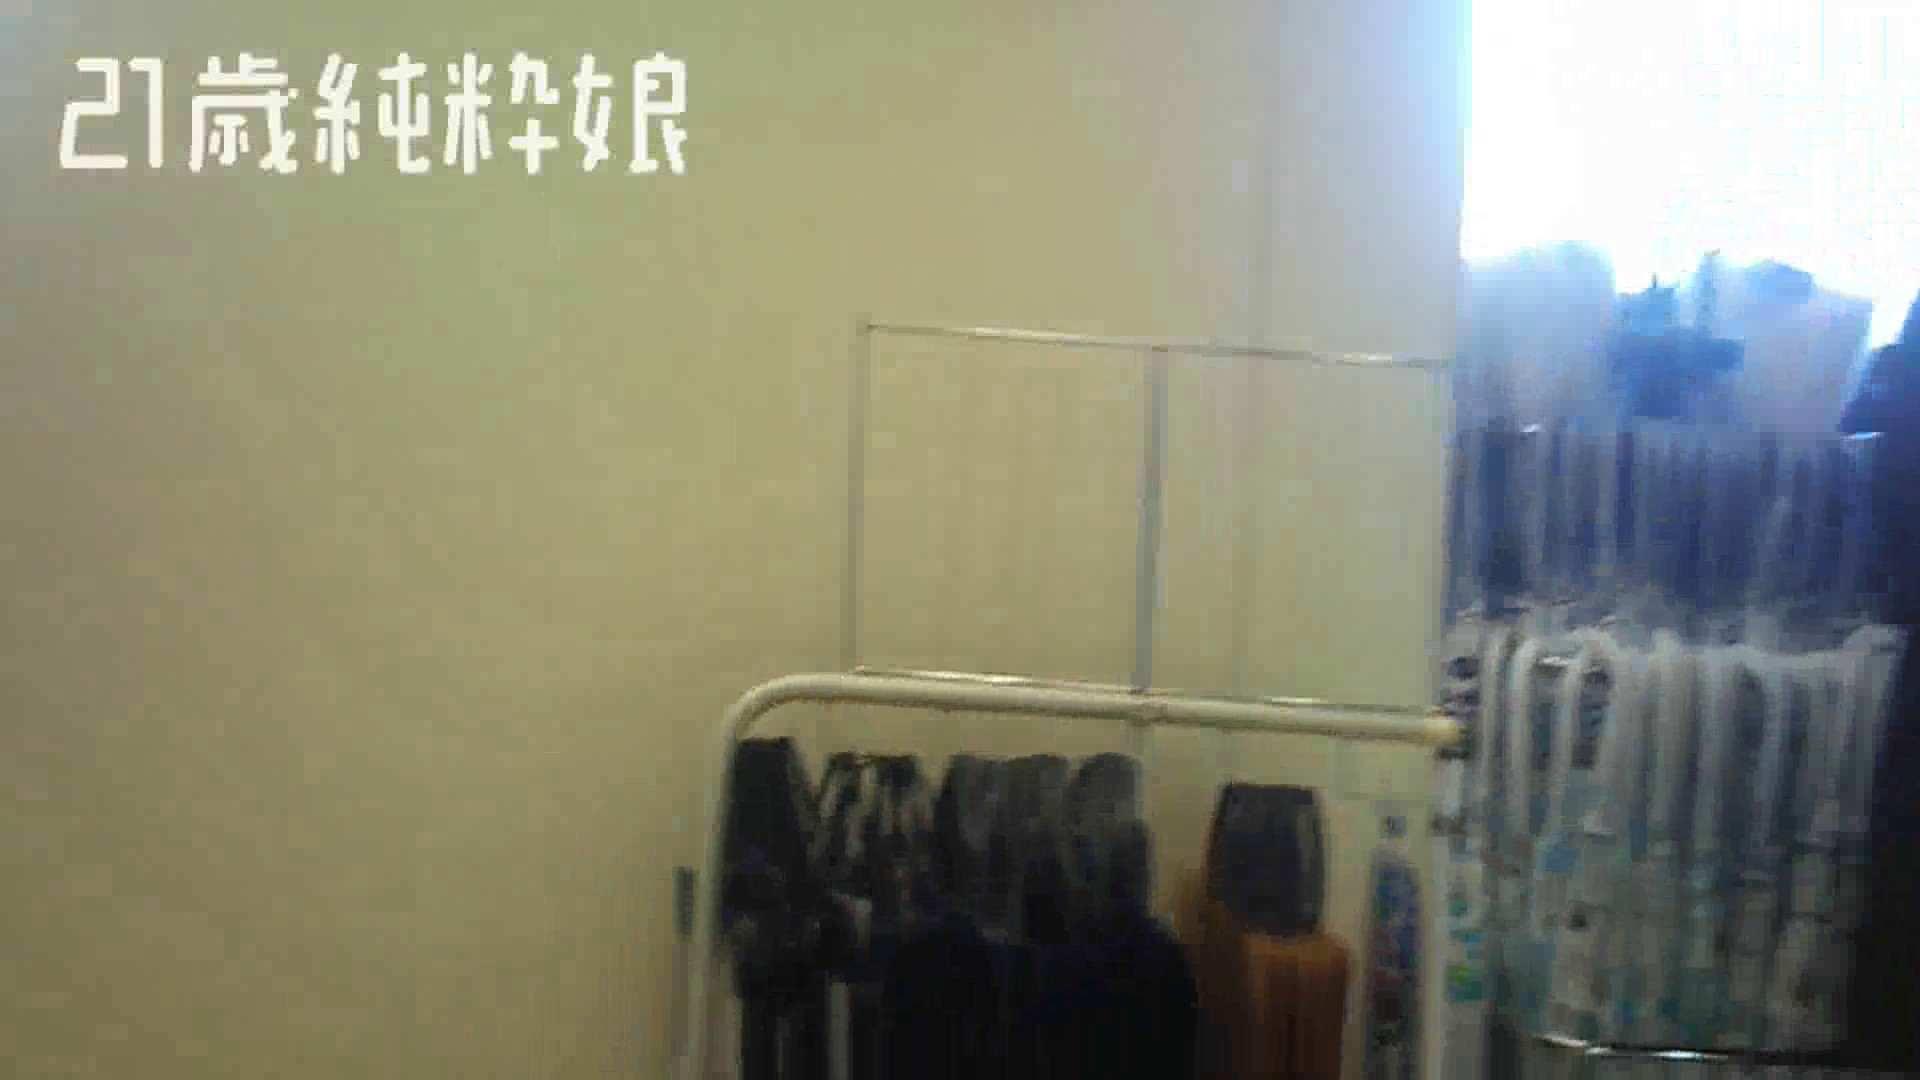 Gカップ21歳純粋嬢第2弾Vol.5 美女OL  78連発 8